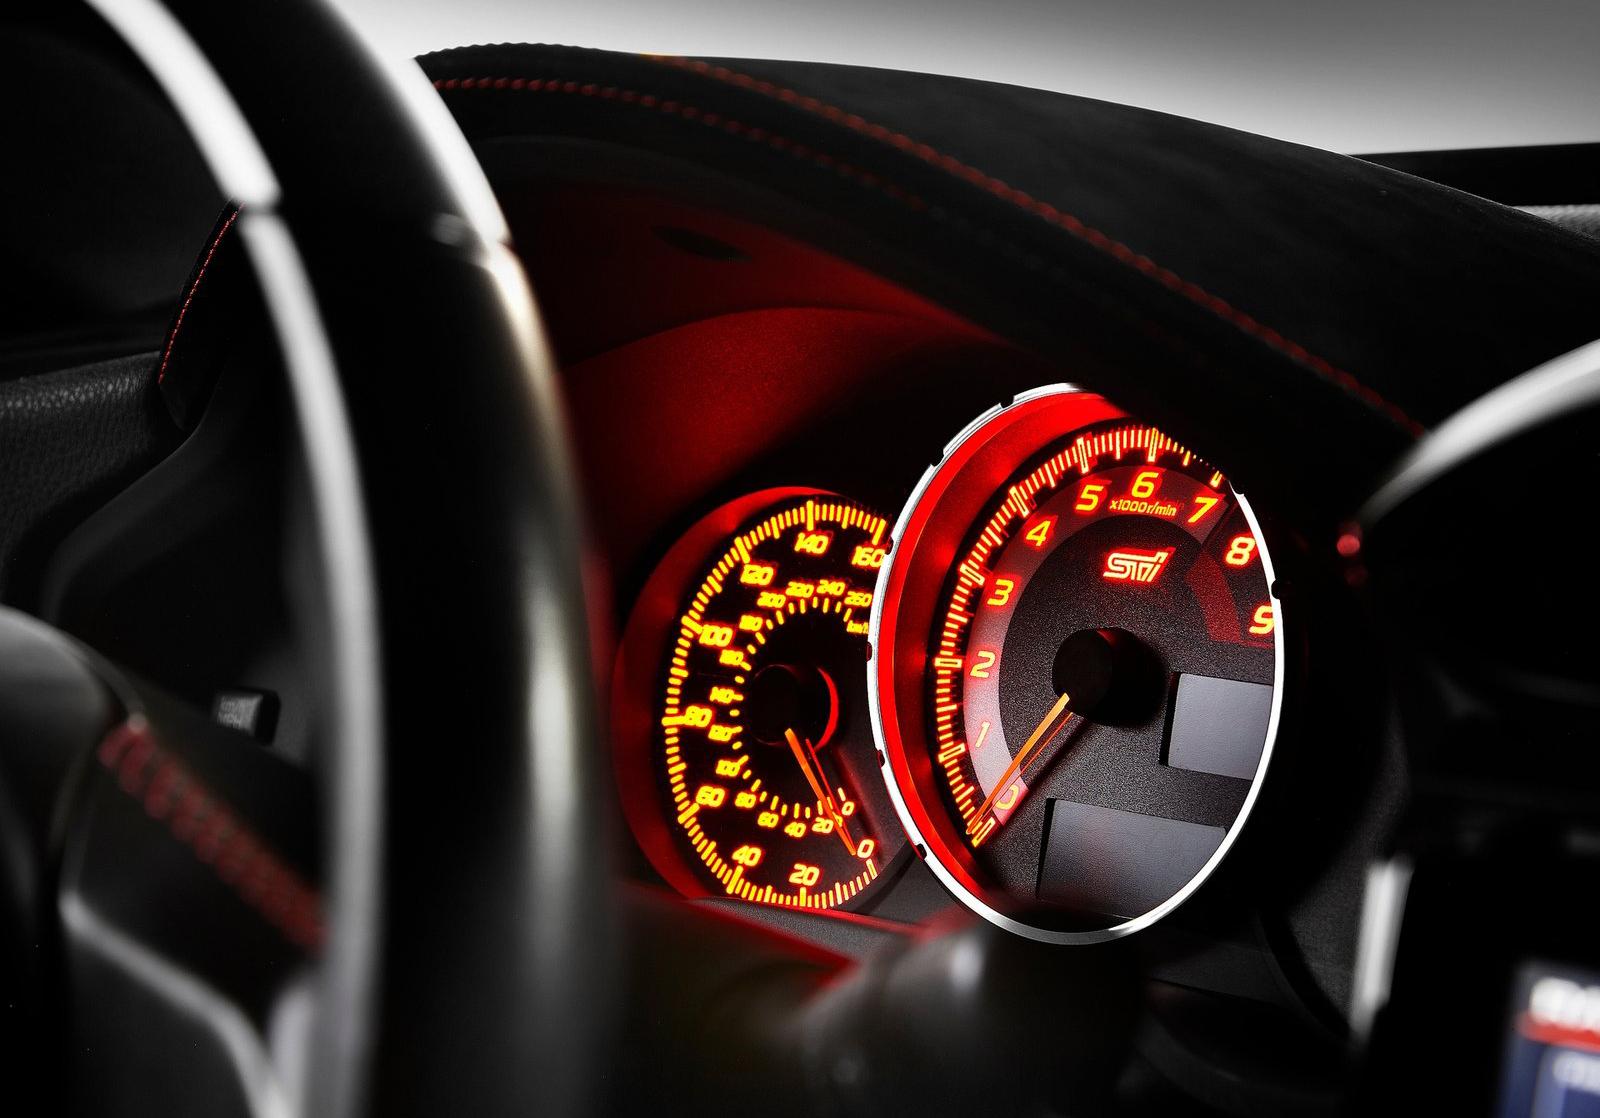 Subaru Brz 2018 Sti >> Subaru BRZ STI Performance Concept – full catalogue Paul Tan - Image 323948